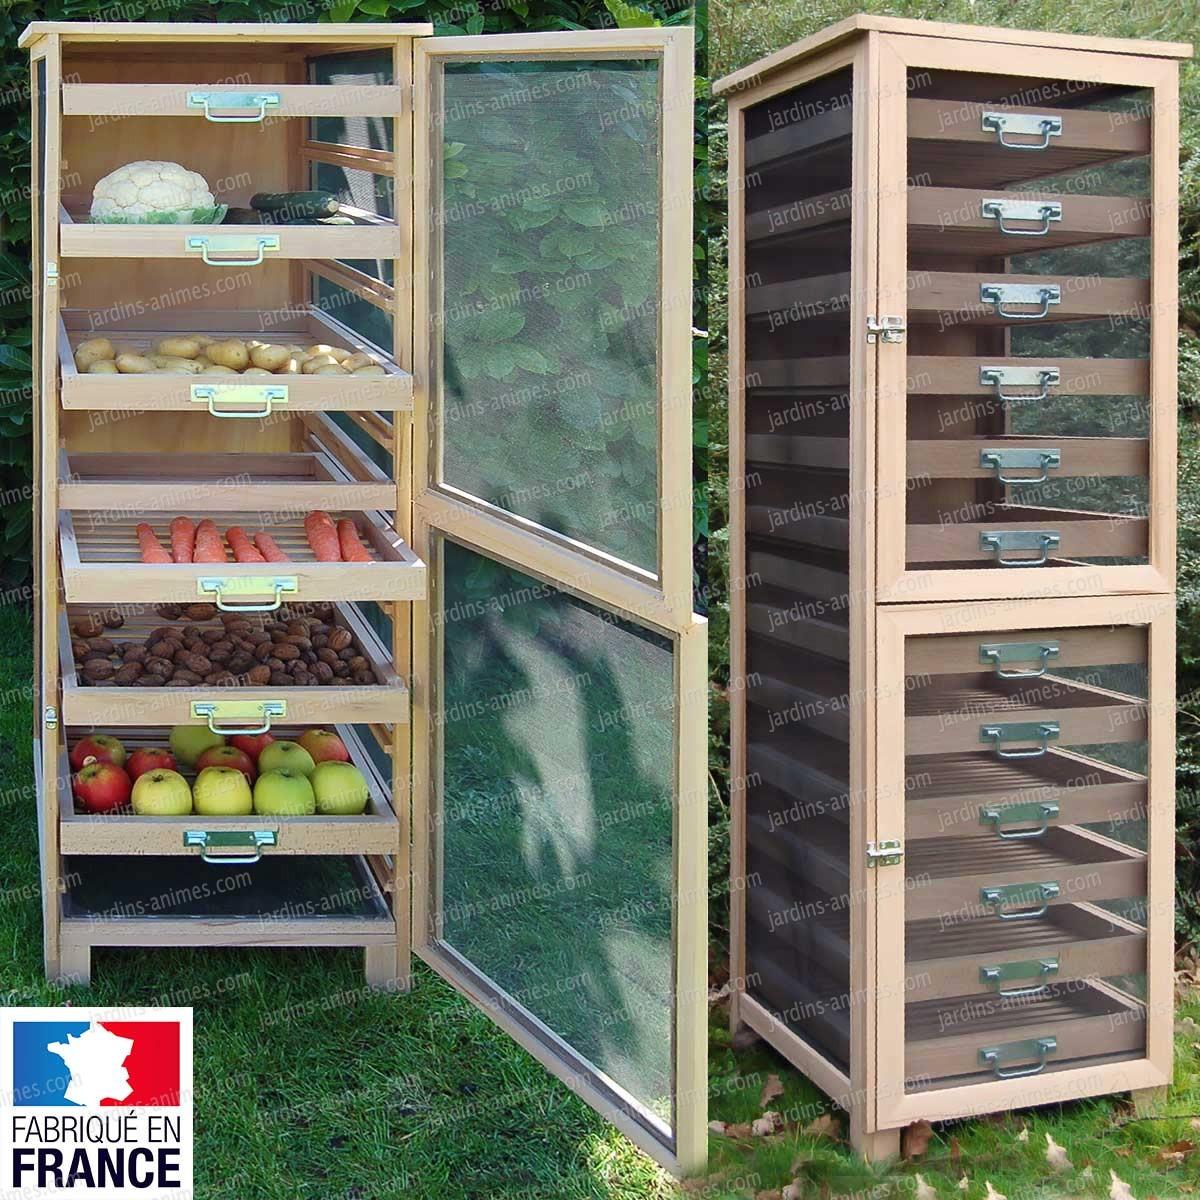 meuble l gumier fruitier 6 tiroirs r colter les fruits. Black Bedroom Furniture Sets. Home Design Ideas